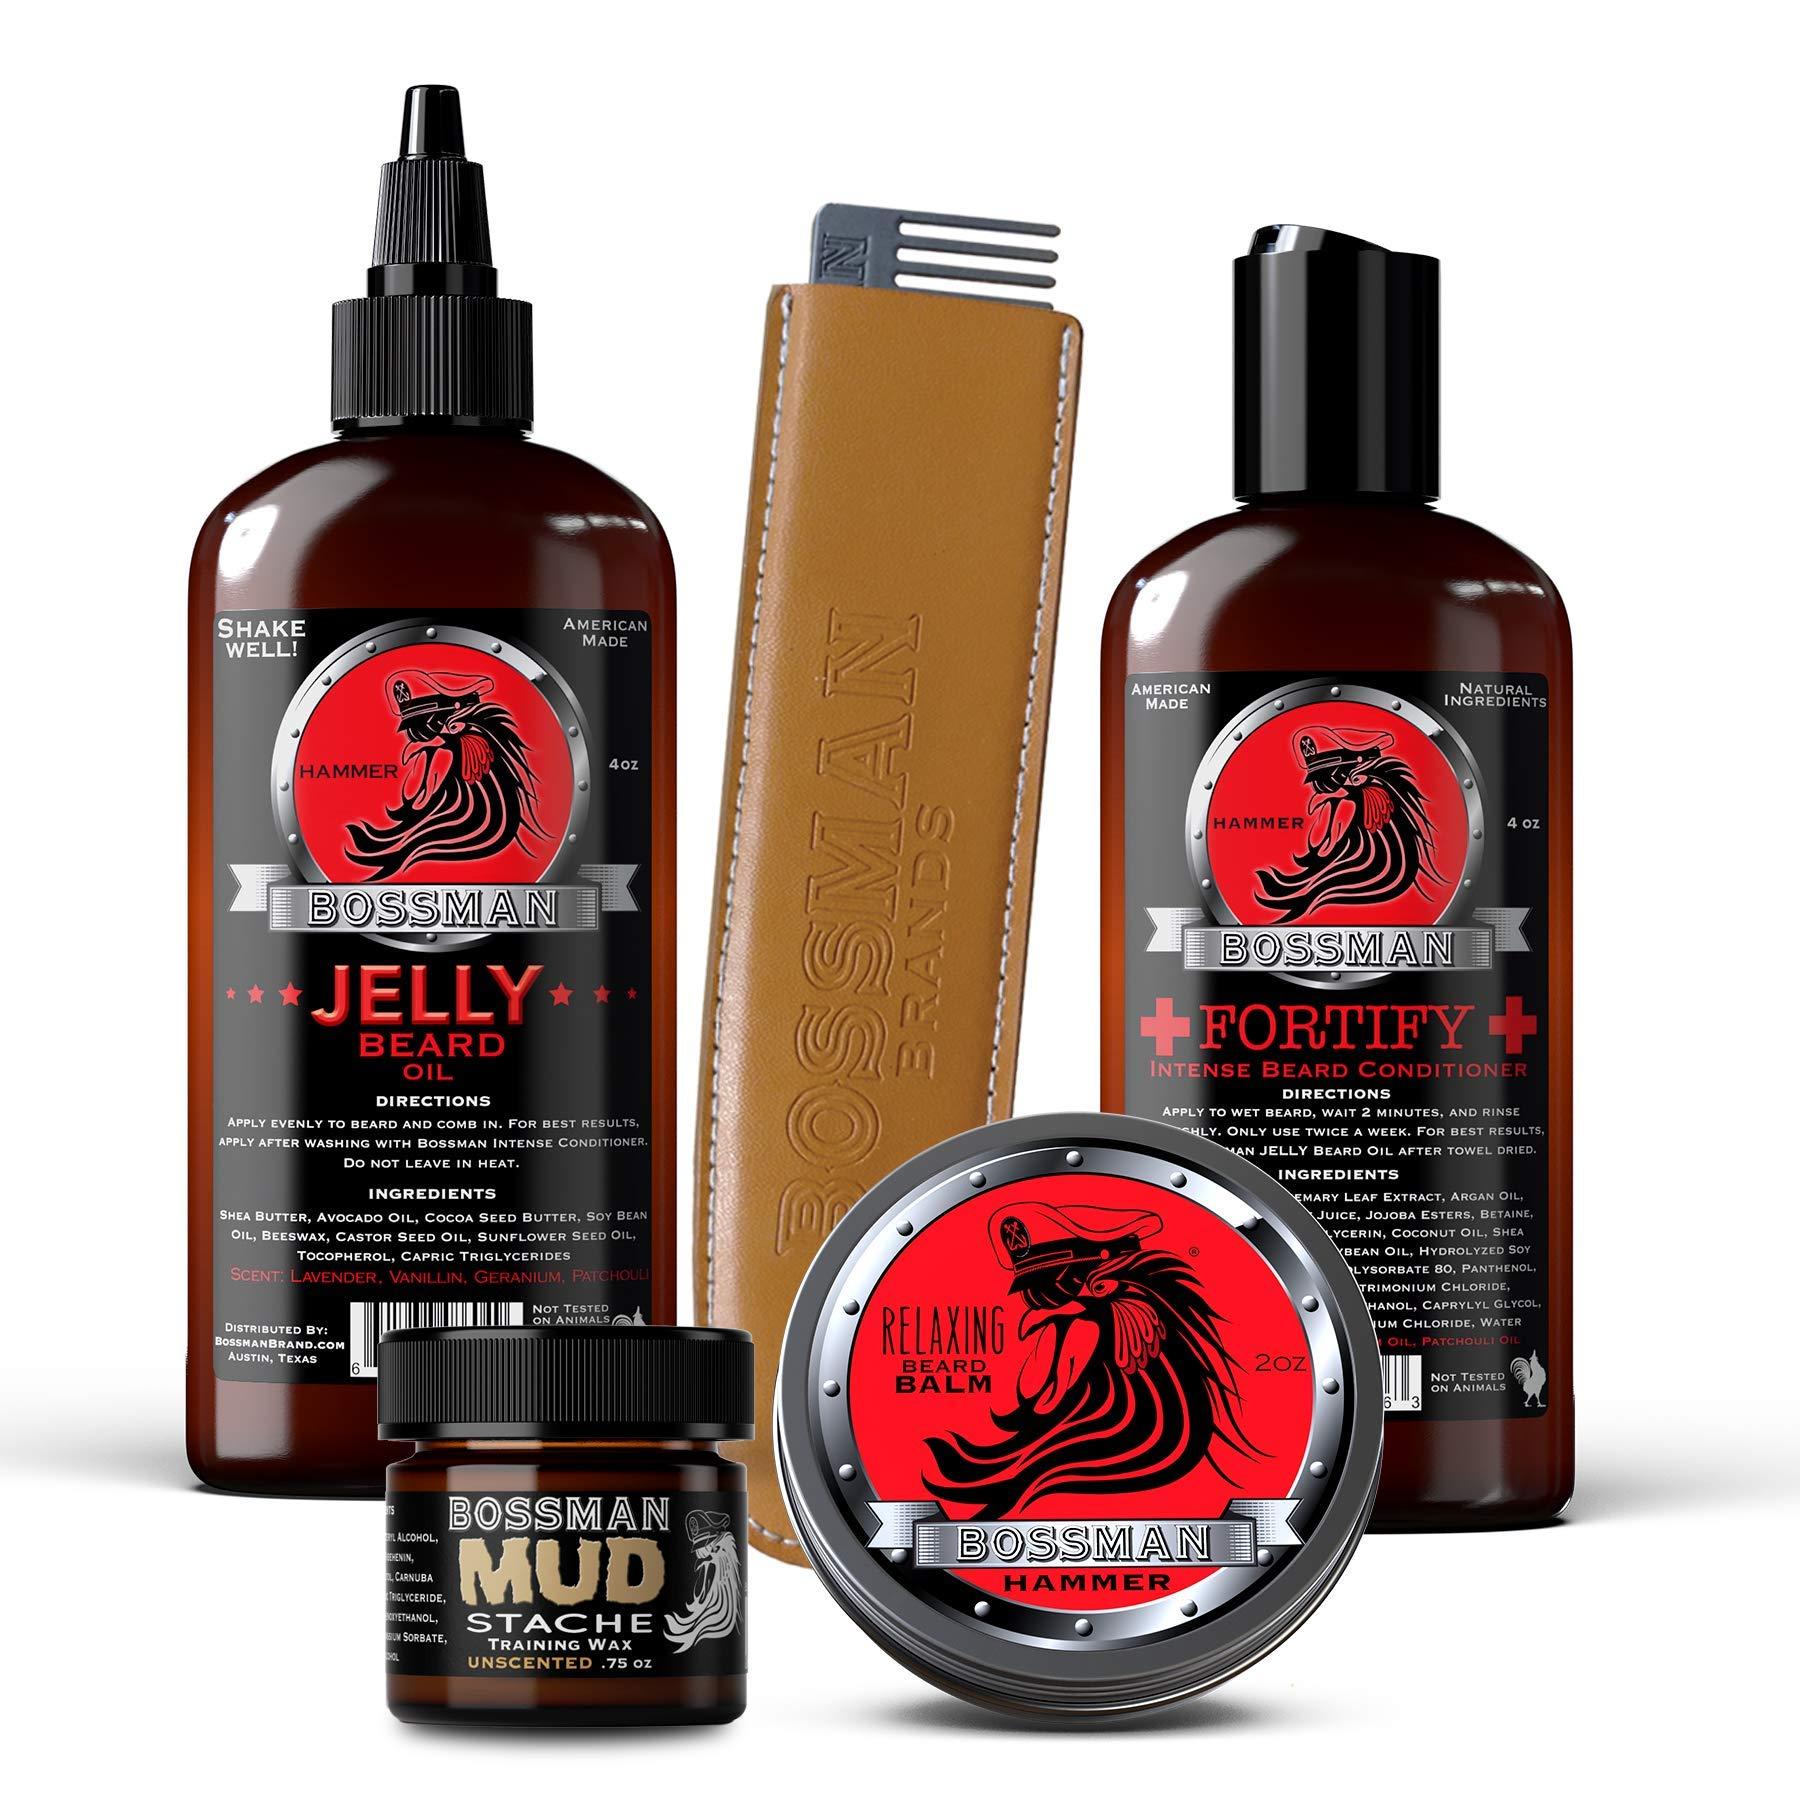 Bossman Complete Beard Kit - Beard Oil, Conditioner, and Balm. Eliminate Beard Itch, Grower a Thicker, More Mature Beard (Hammer Scent) by Bossman